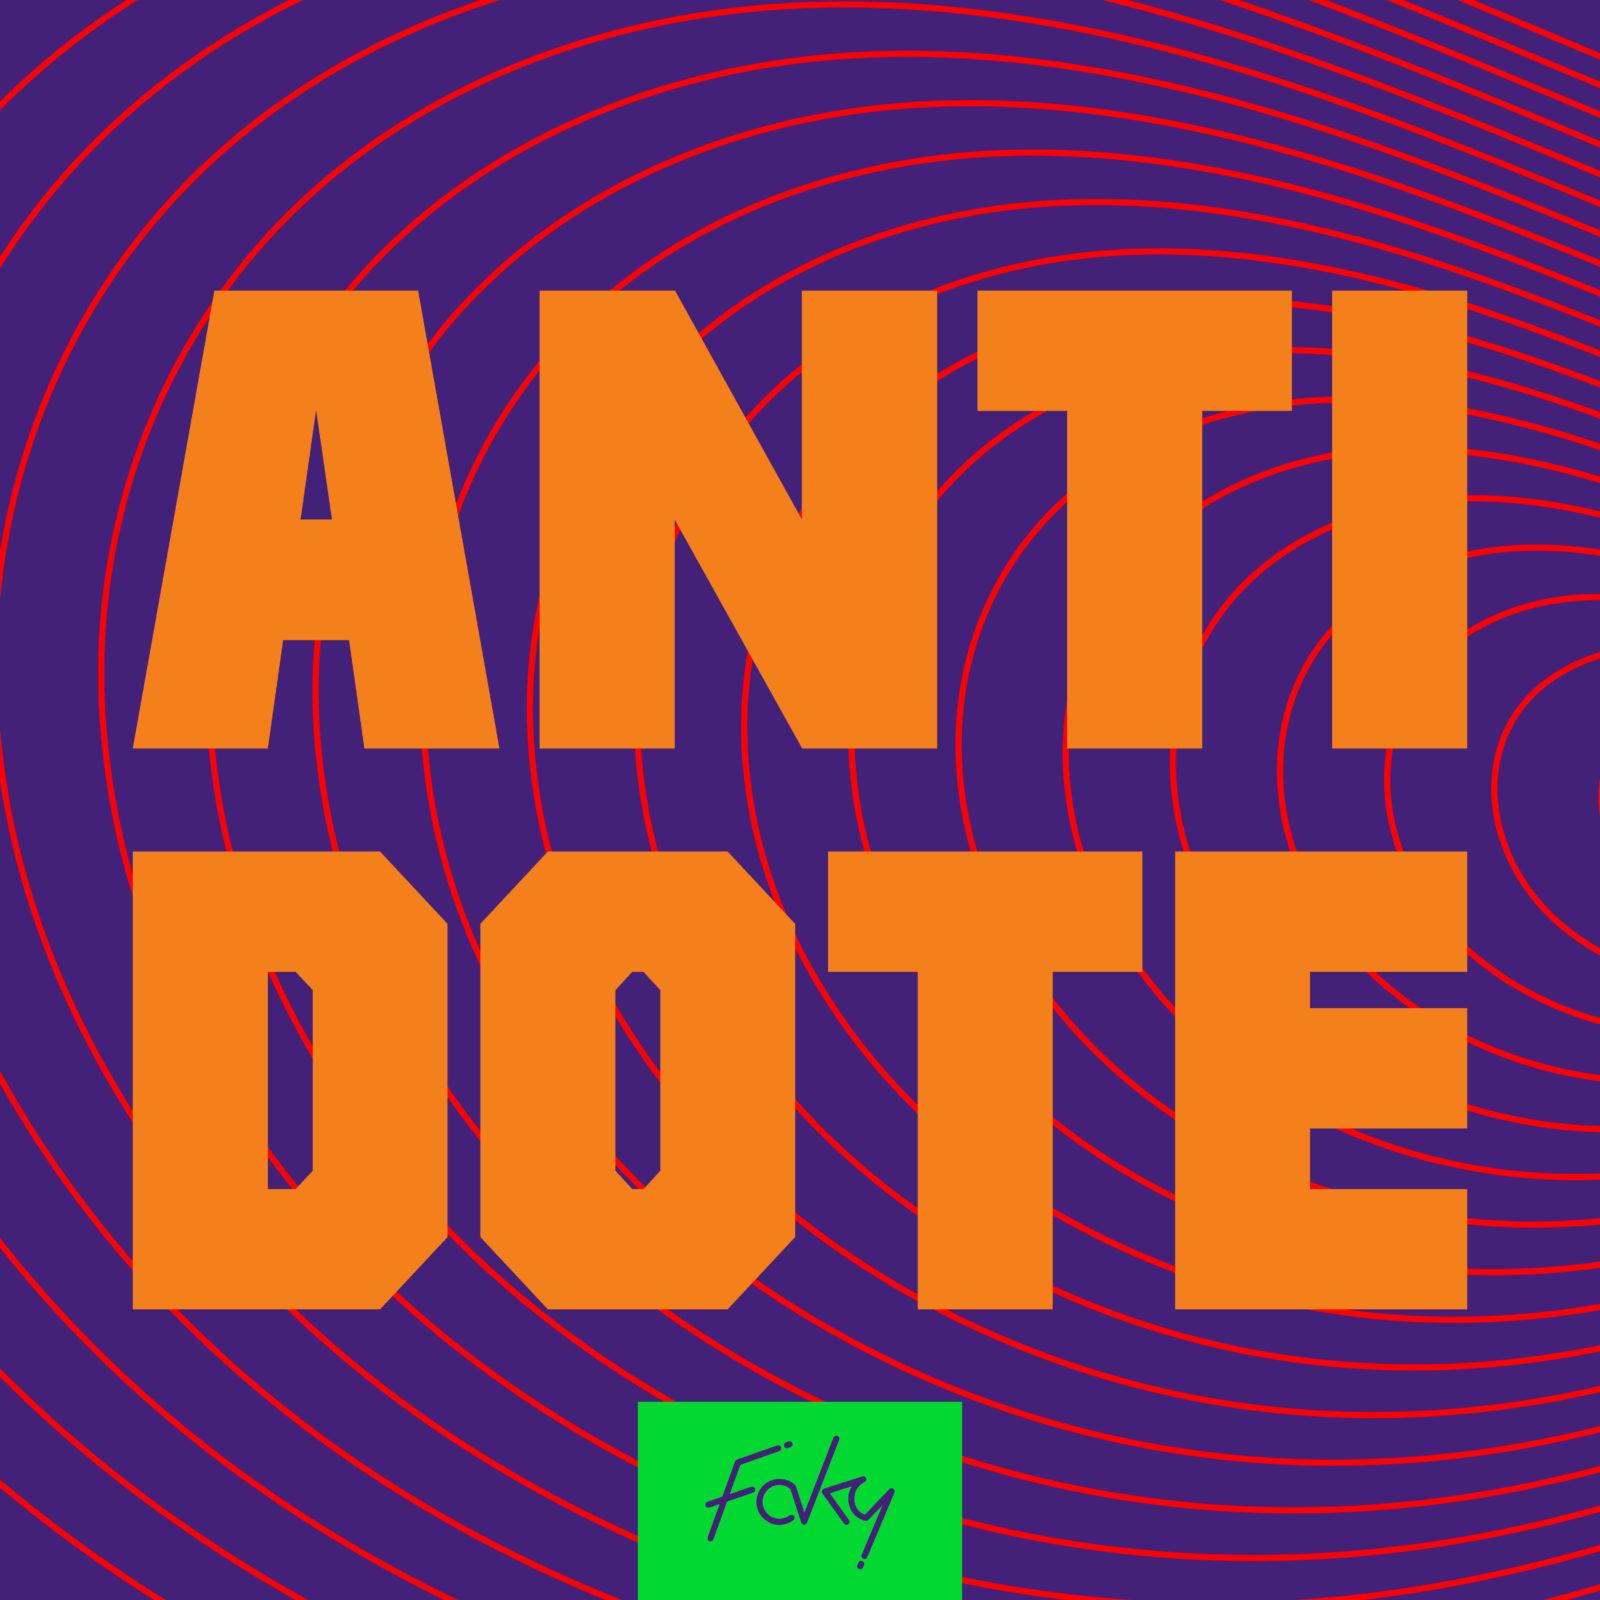 FAKY、Awich作詞「ANTIDOTE」をJ-WAVEで初解禁